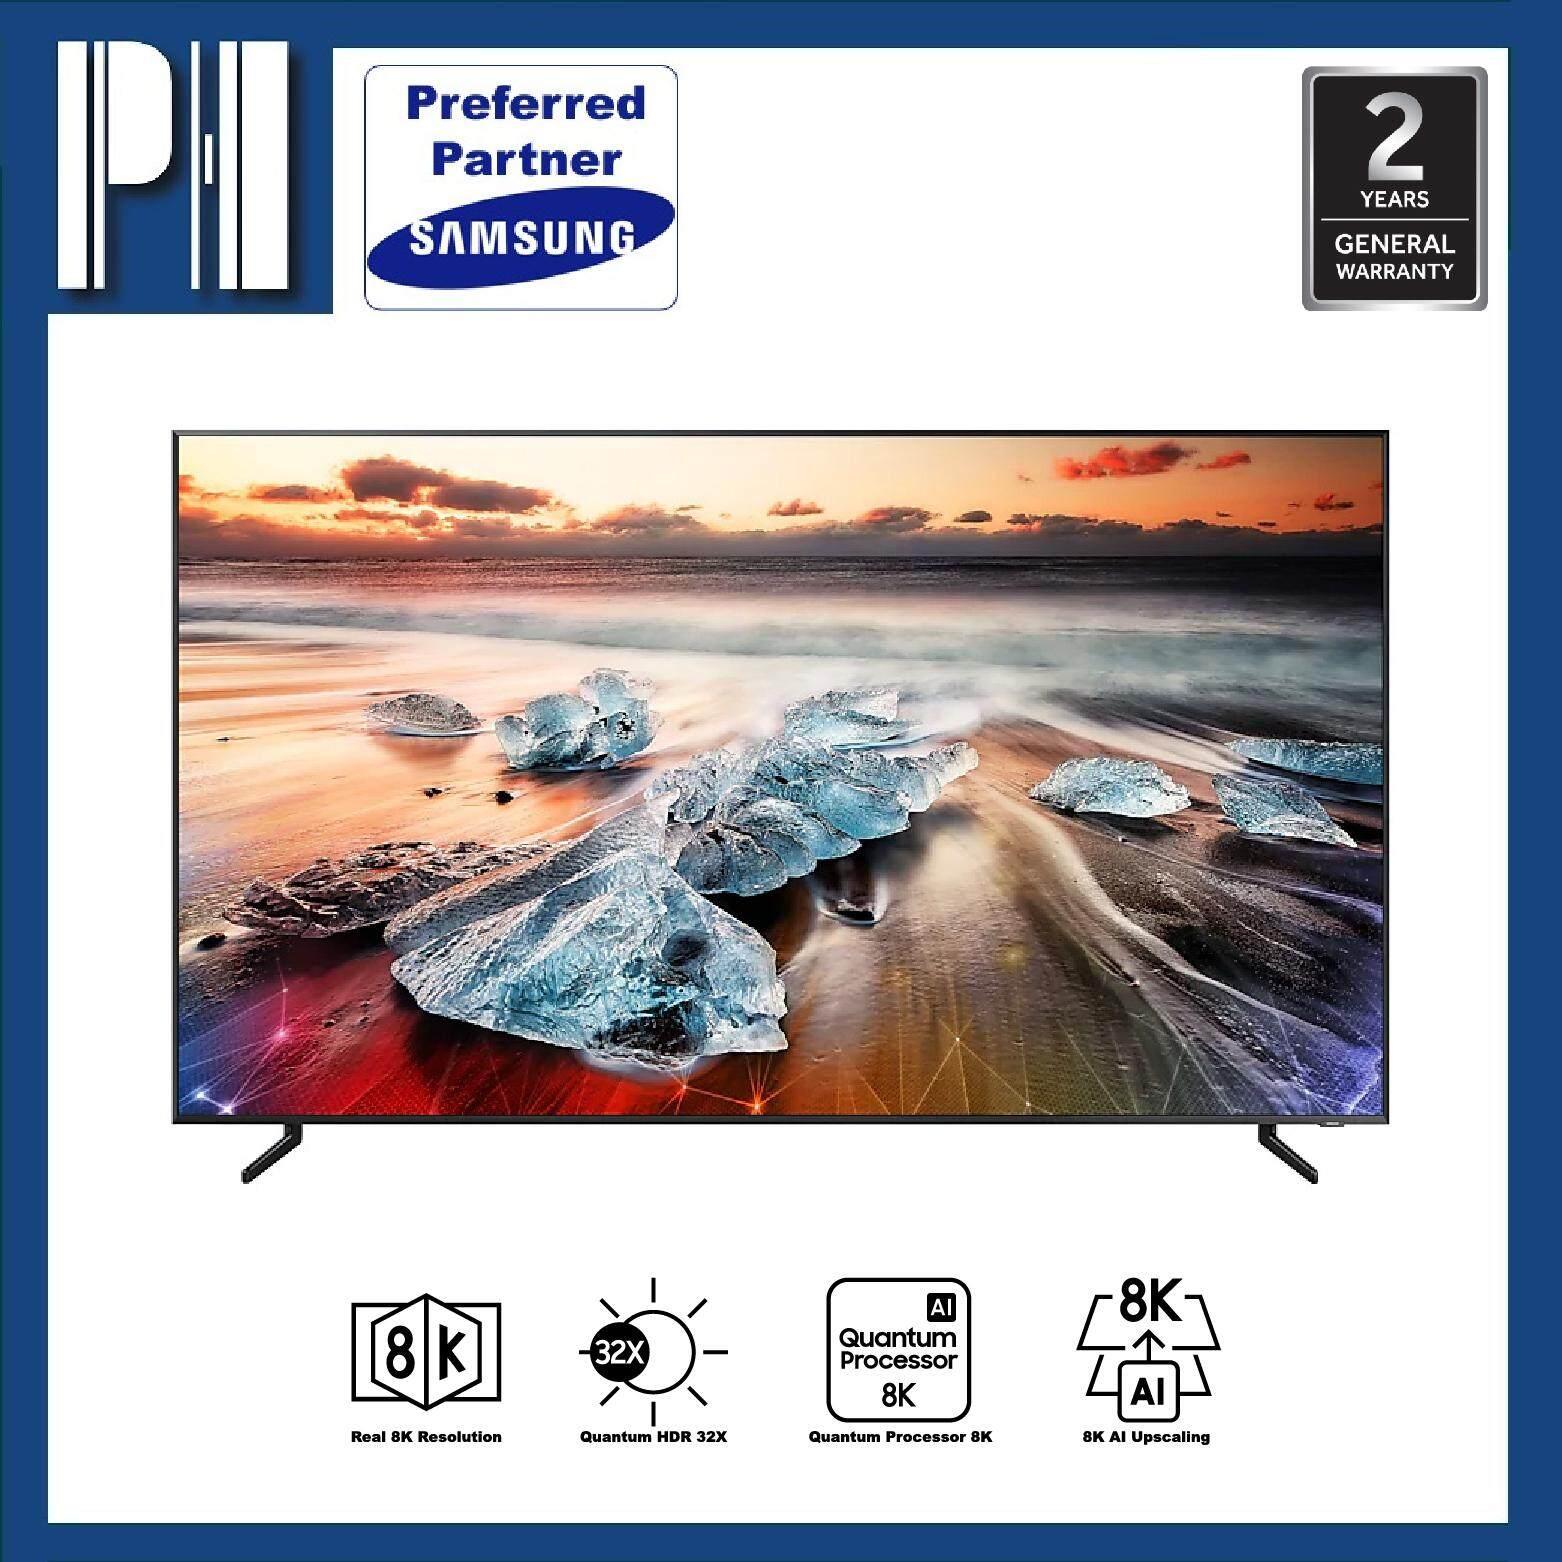 Samsung Qa82q900rbkxxm 82 Q900 8k Smart Qled Tv By Ph Chain Store.